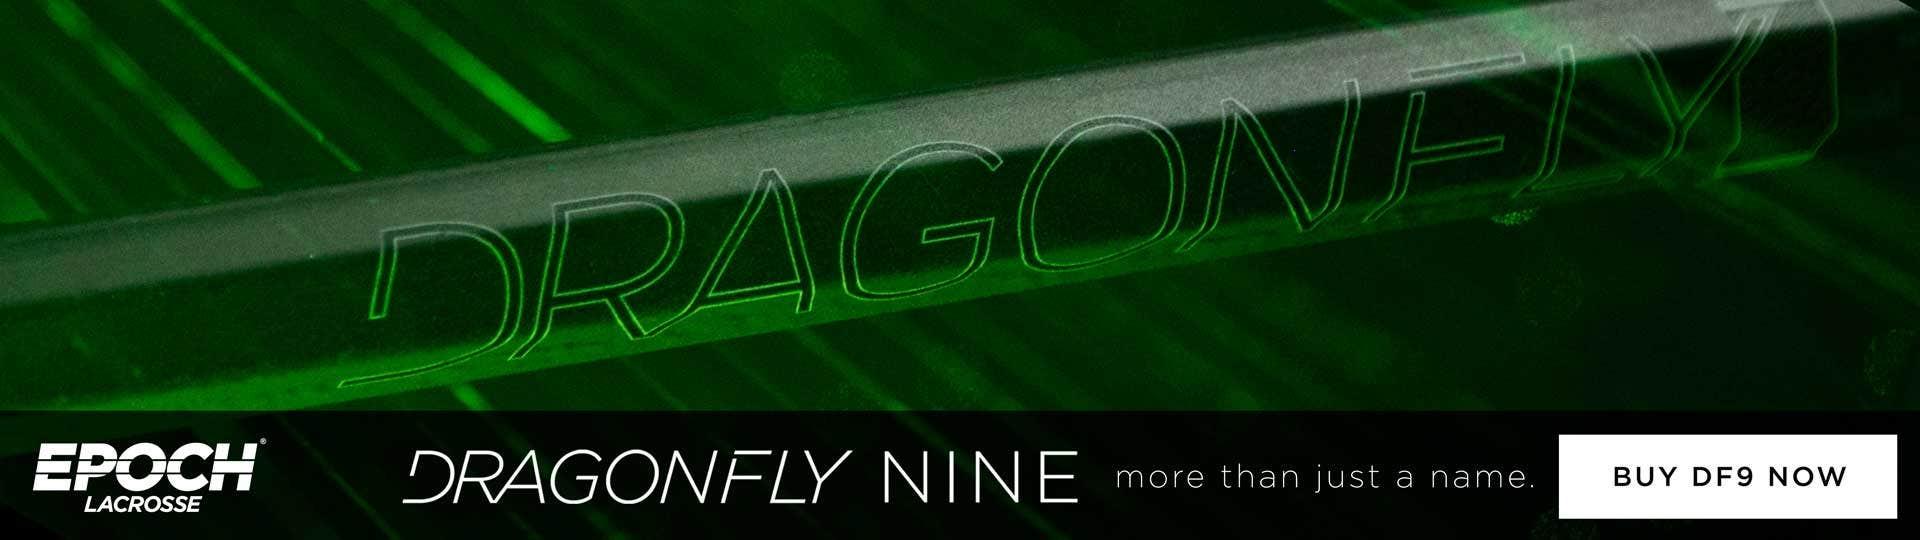 EPOCH Dragonfly 9